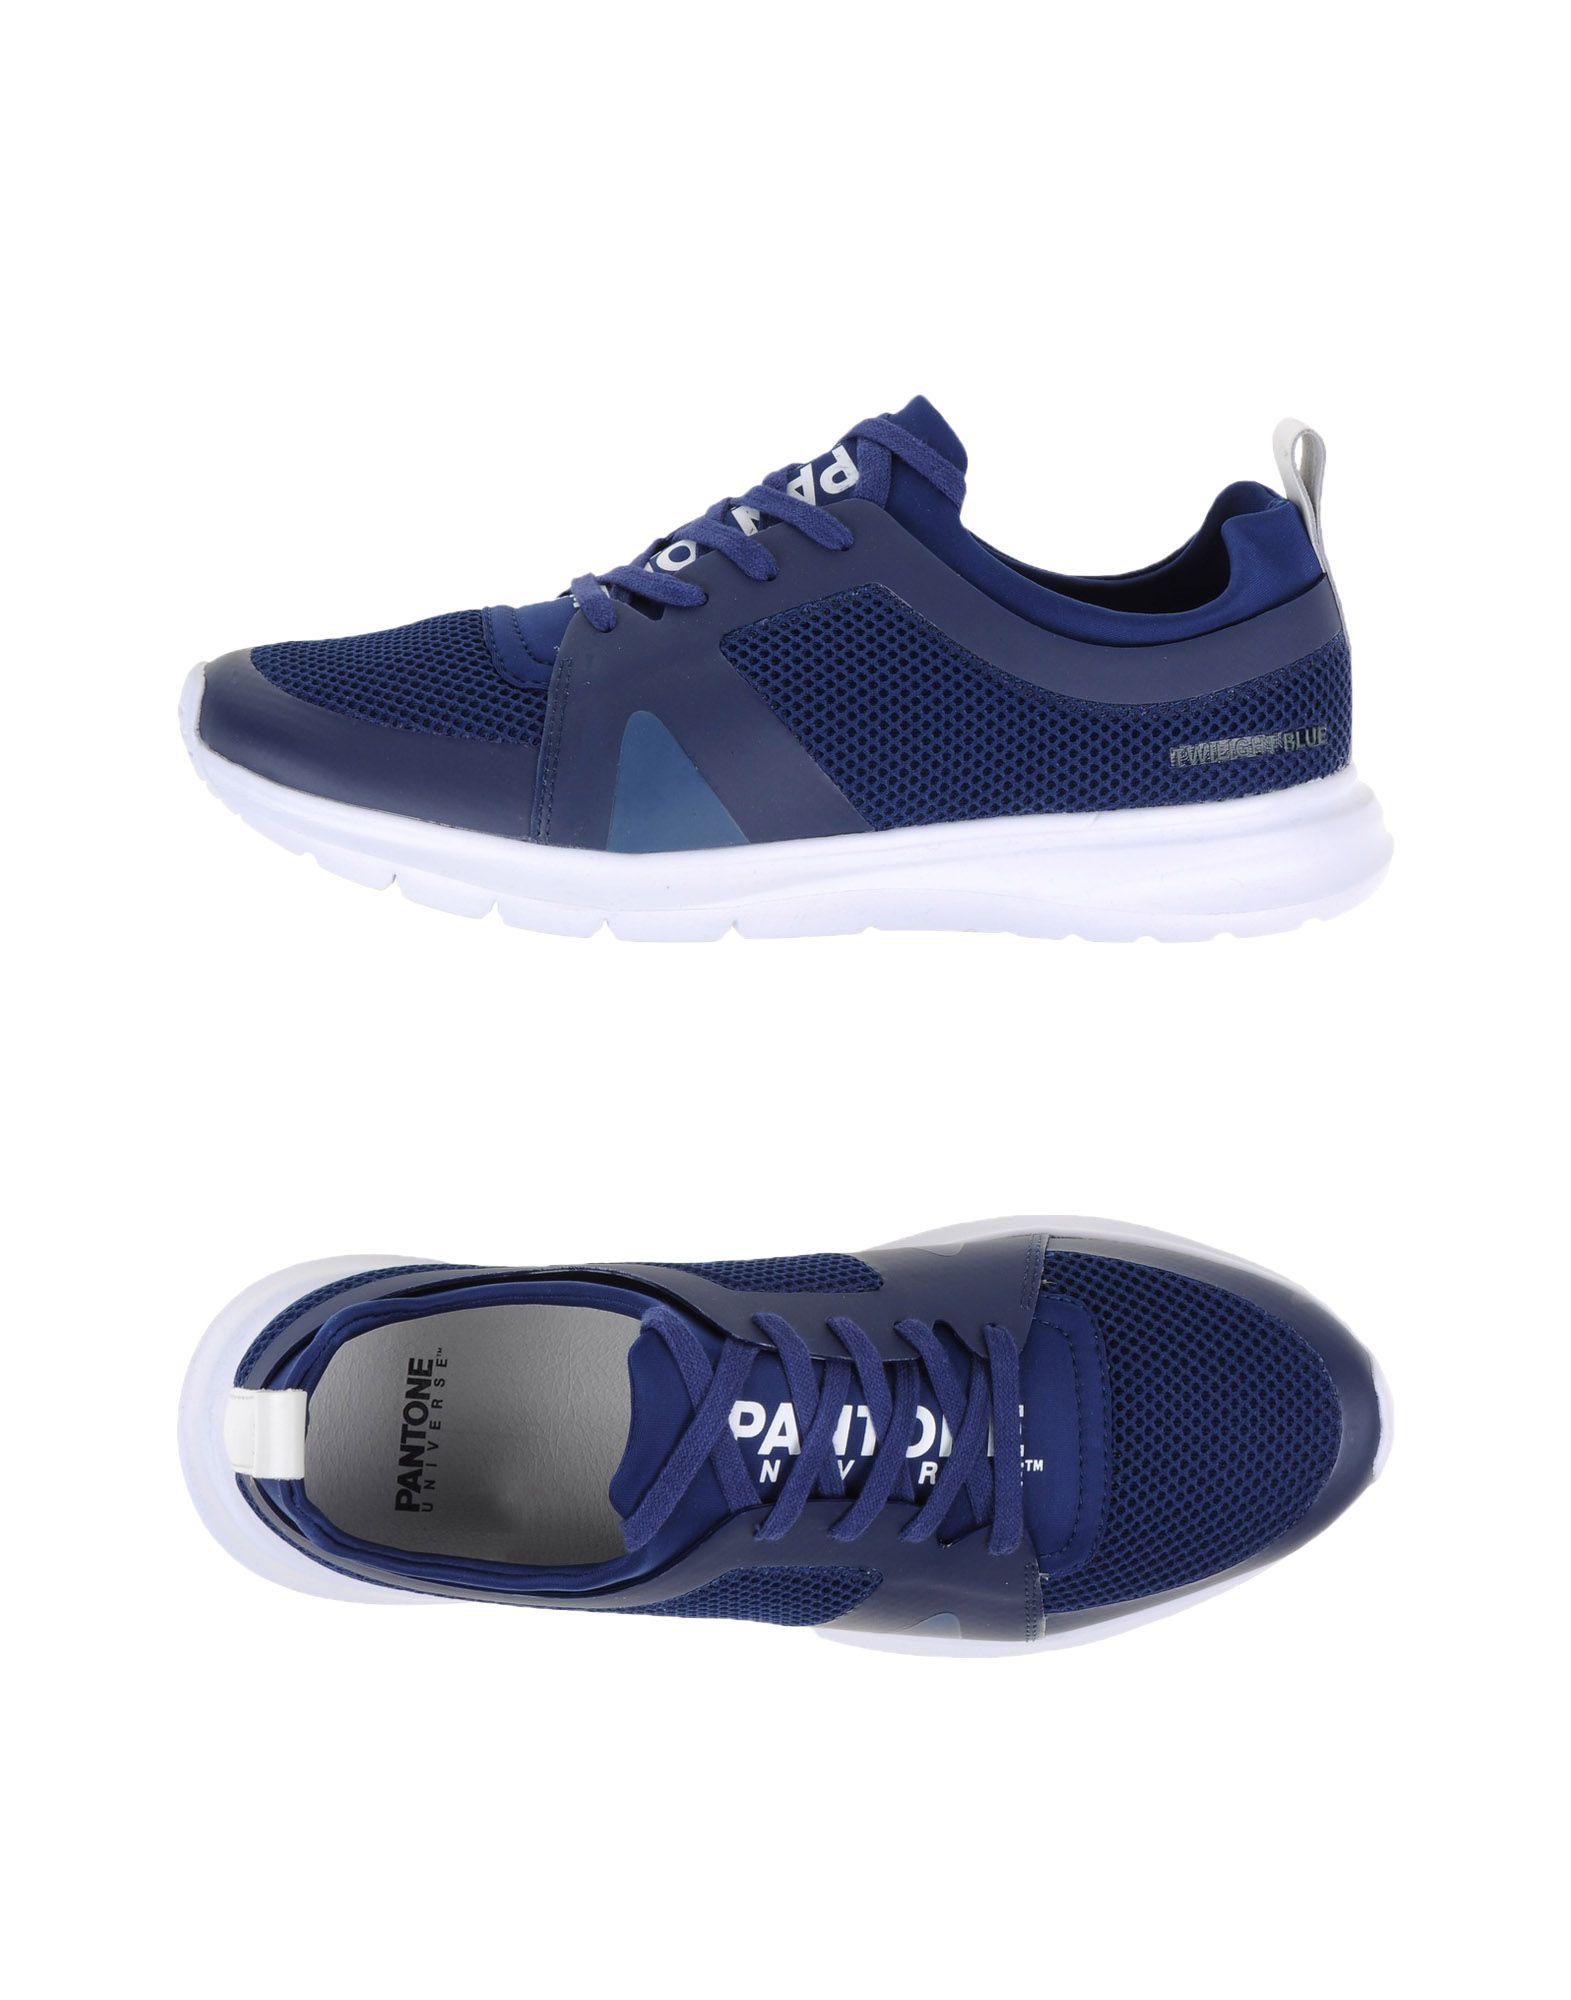 Sneakers Pantone Universe Footwear Kilimanjaro - Homme - Sneakers Pantone Universe Footwear sur